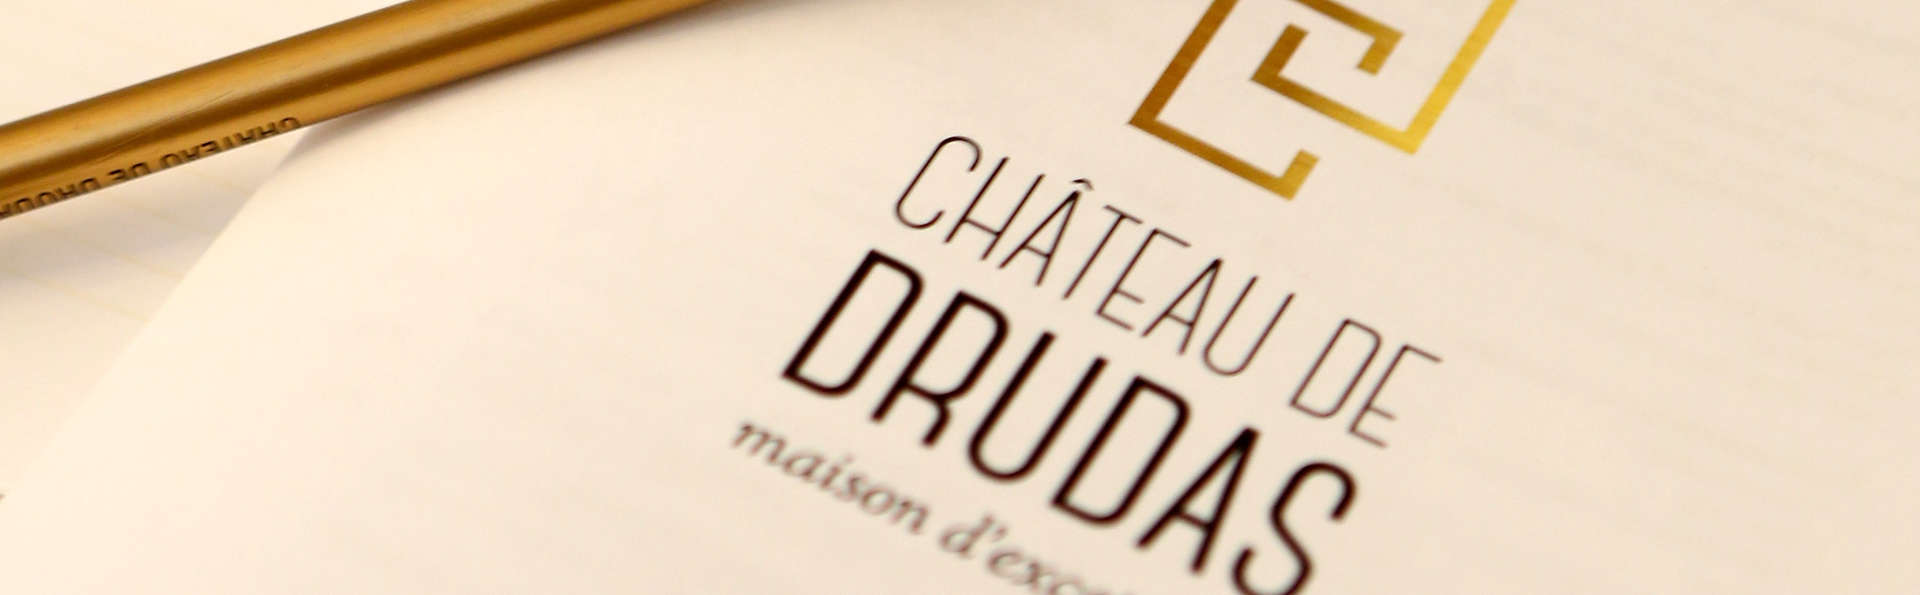 Château de Drudas - EDIT_NEW_detail.jpg